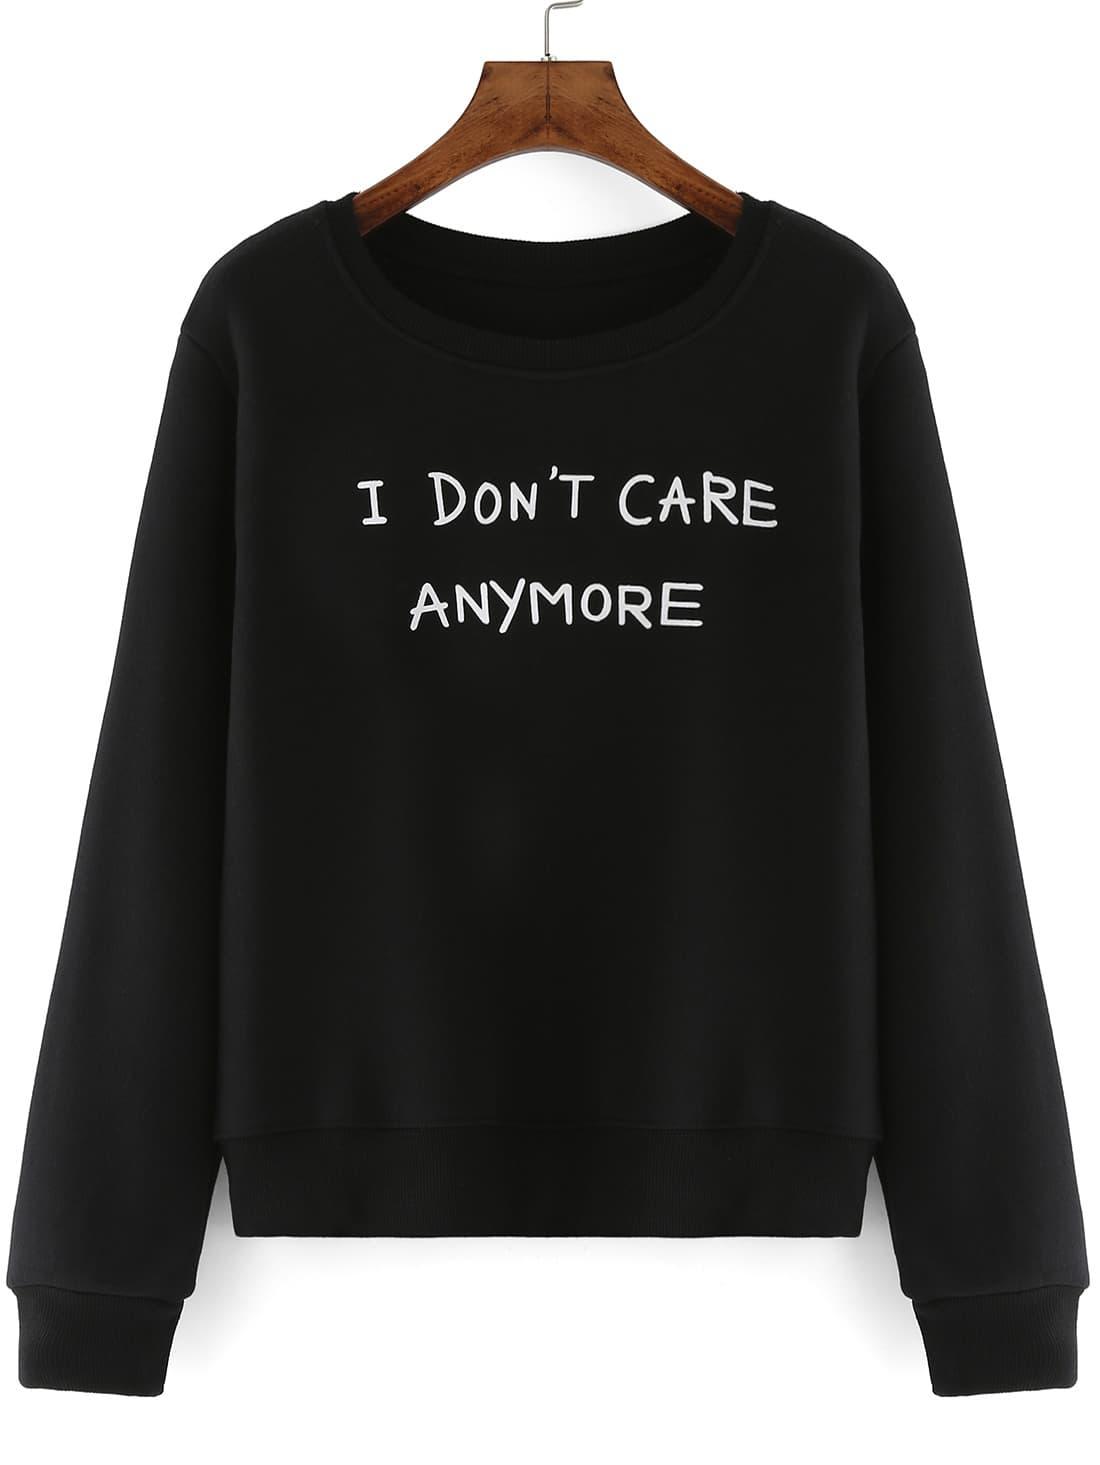 Round neck letter print black sweatshirtfor women romwe for Letters for sweatshirts